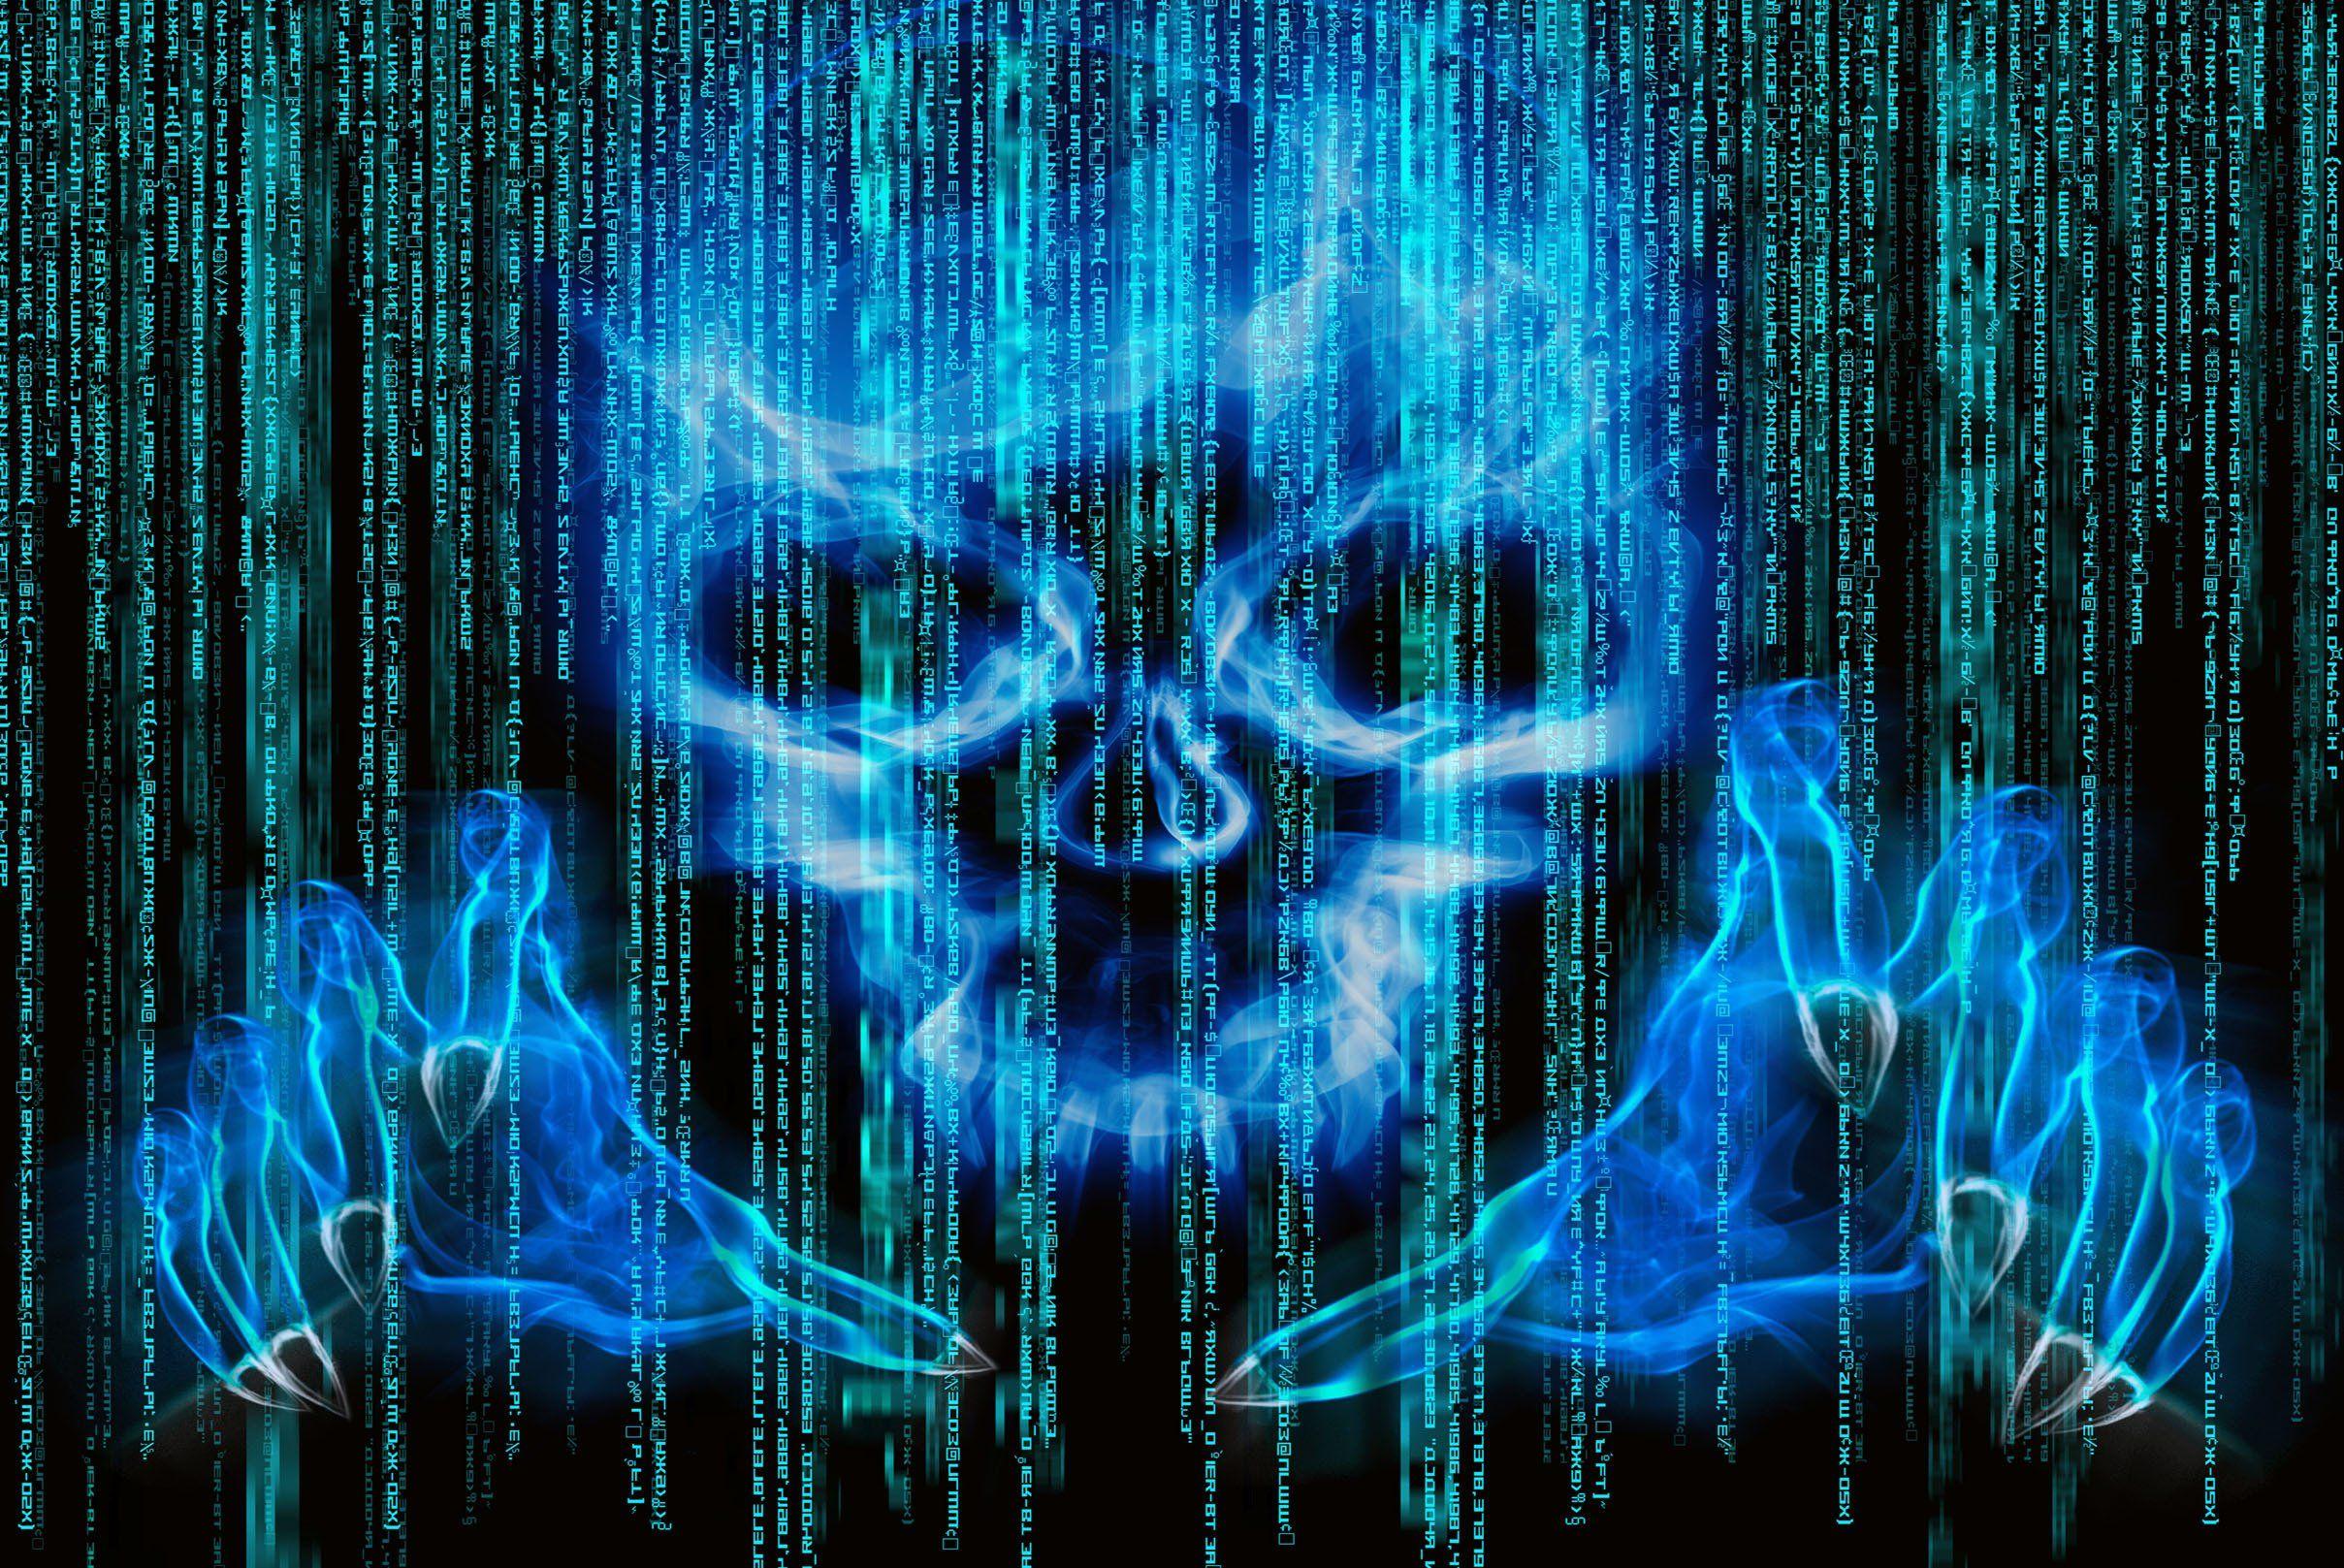 30 Anime Computer Virus Wallpapers   Download at WallpaperBro 2417x1617